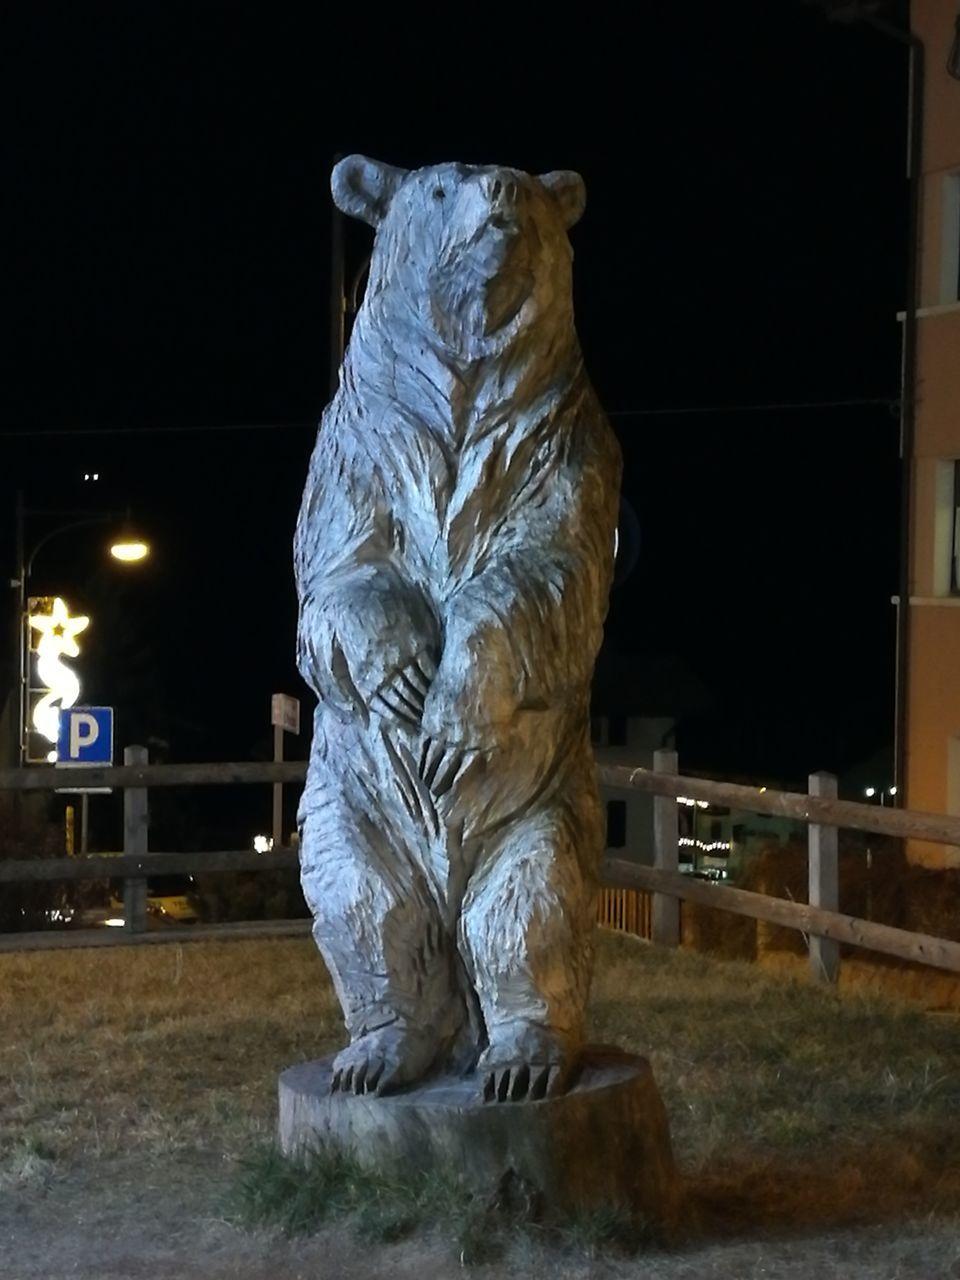 night, illuminated, sculpture, statue, no people, outdoors, black background, animal themes, close-up, mammal